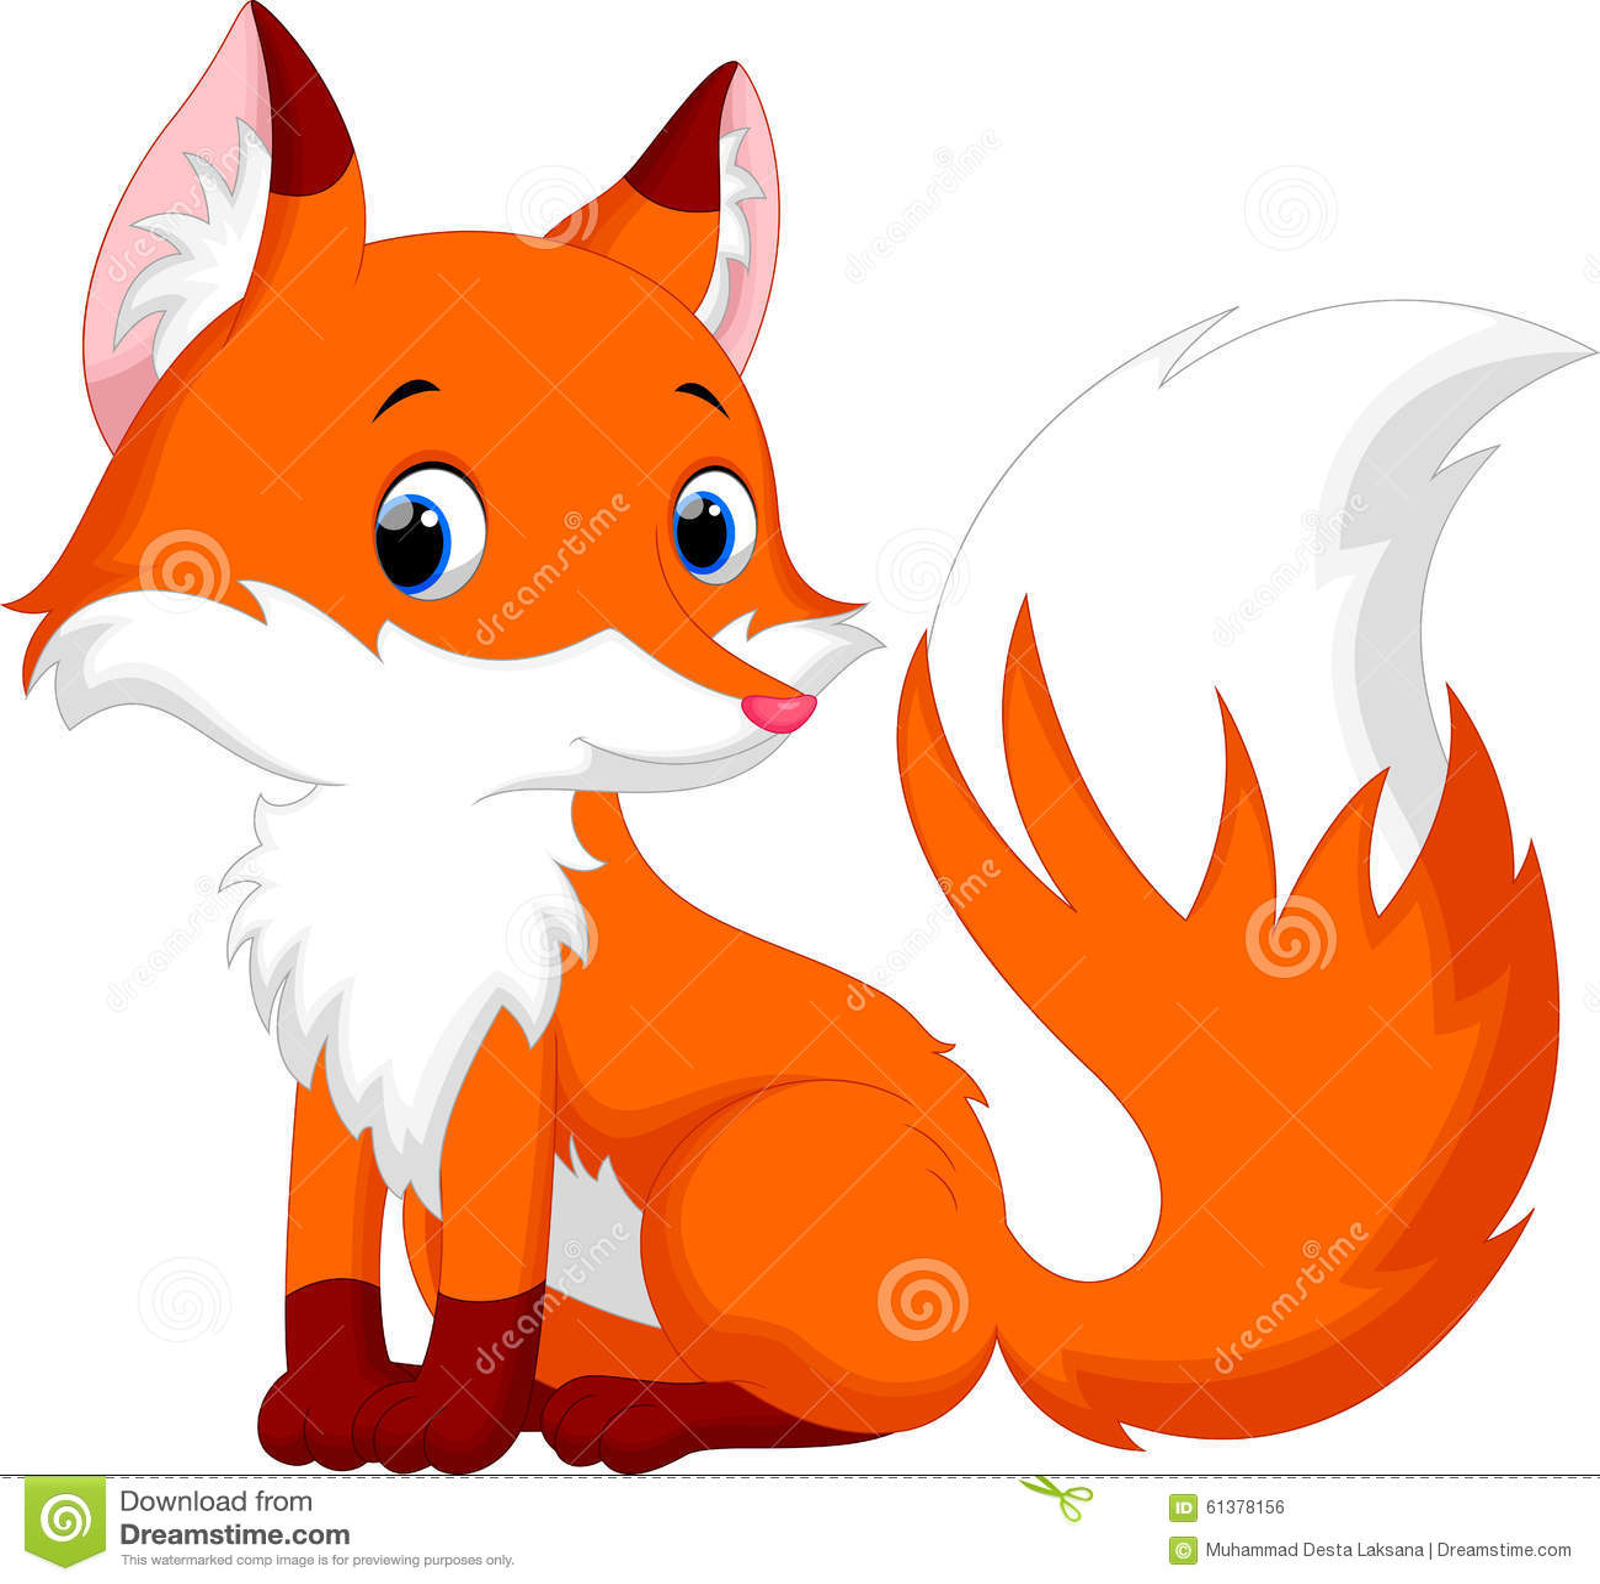 Cute Fox Cartoon Stock Illustration - Image: 61378156